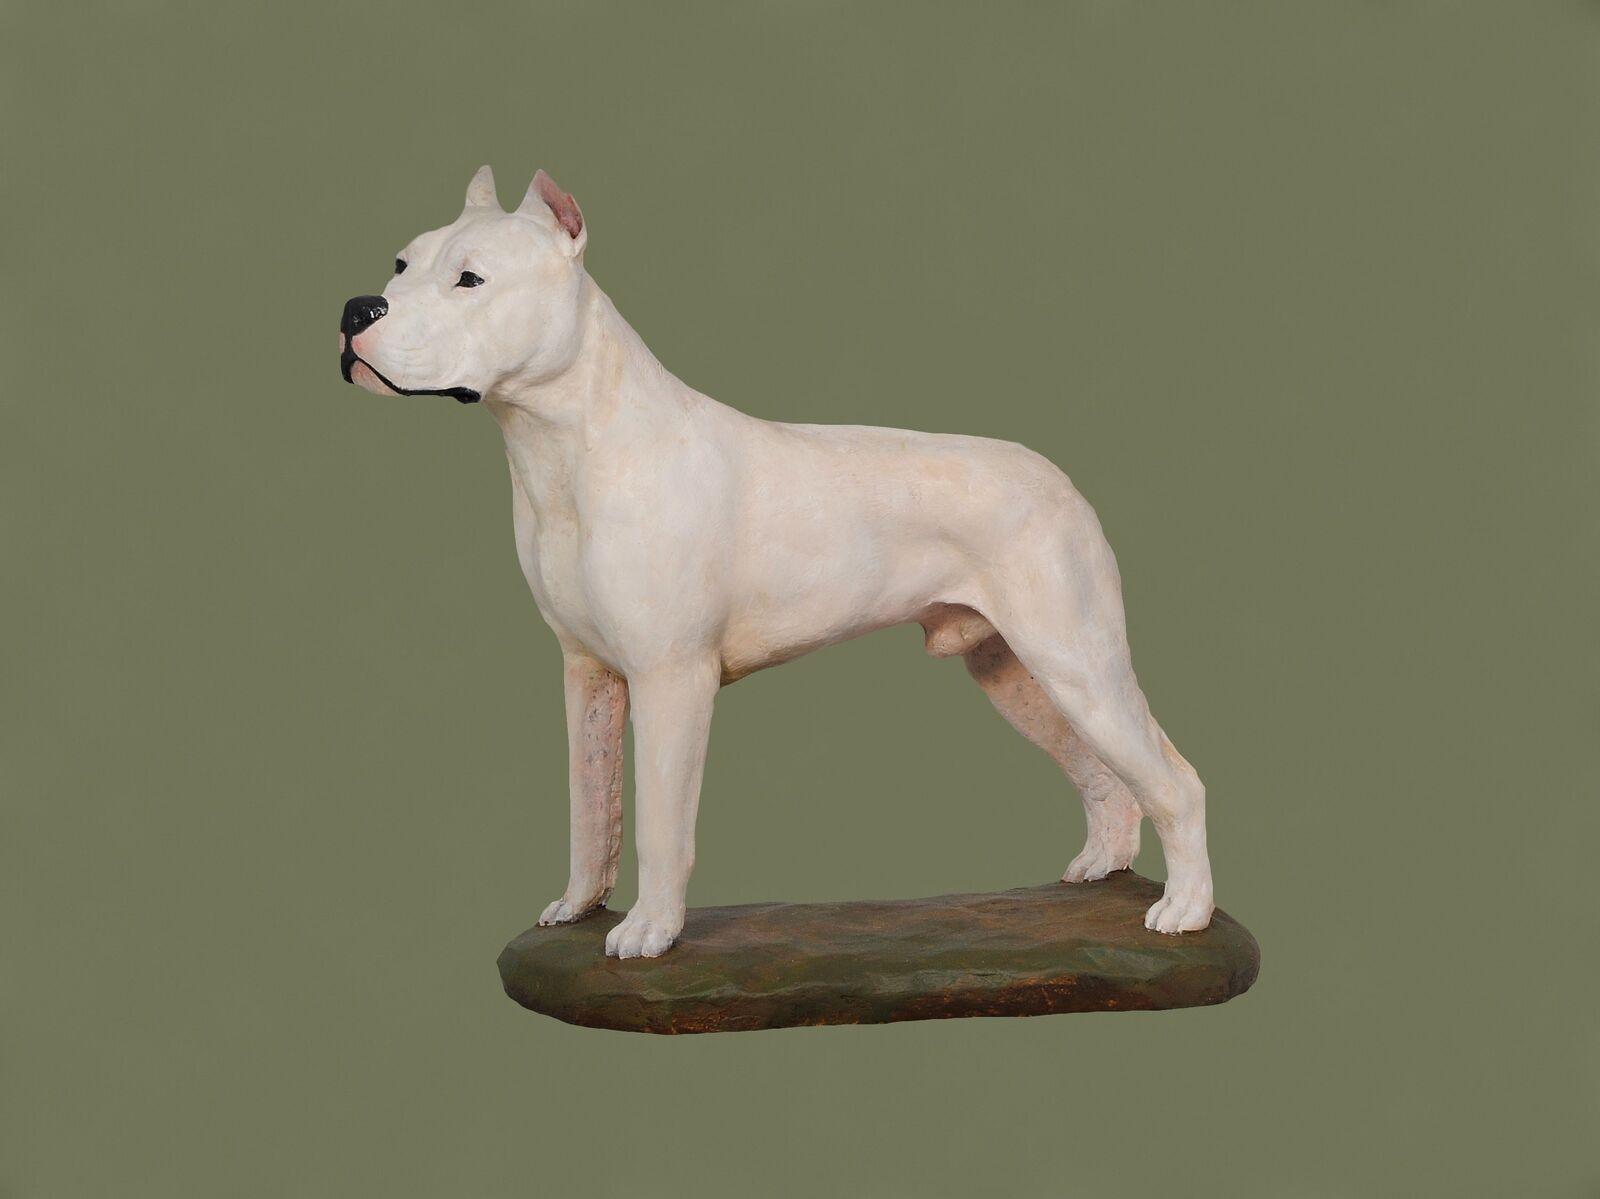 Dogo Silberino - dog painted figurine on wooden base, high quality, Art Dog